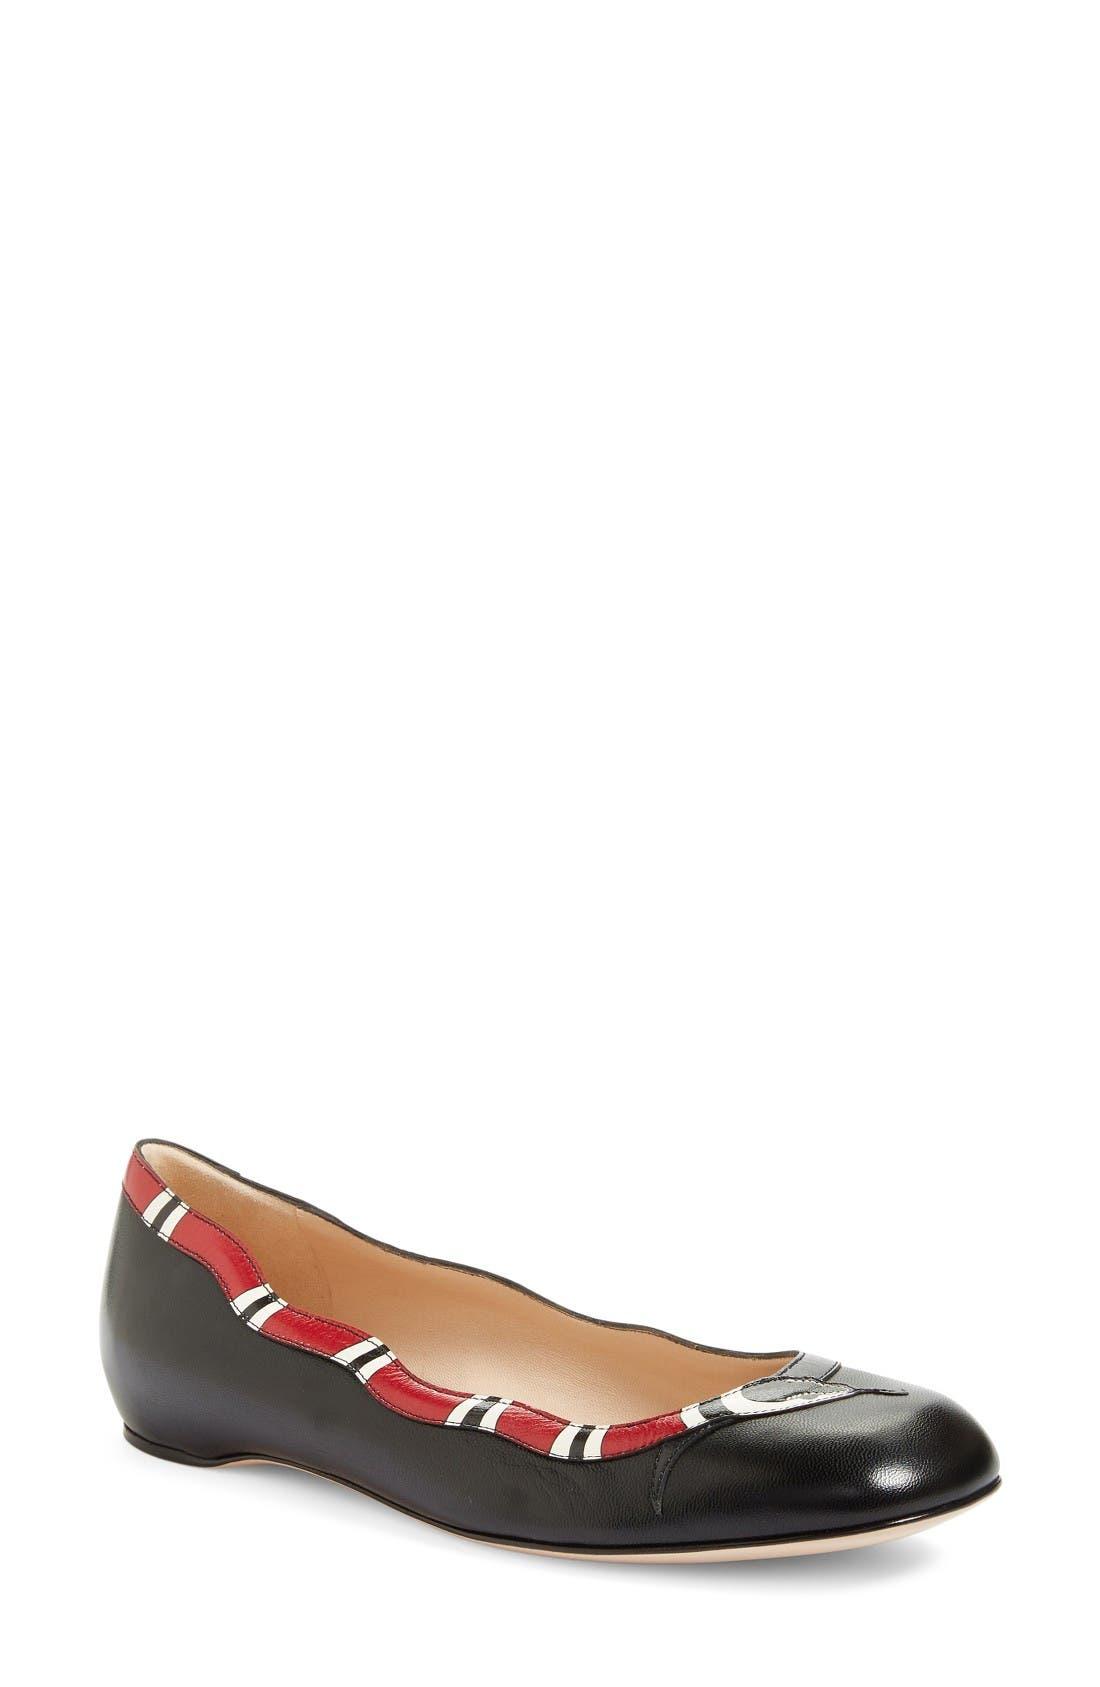 Gucci Kingsnake Ballet Flat (Women)